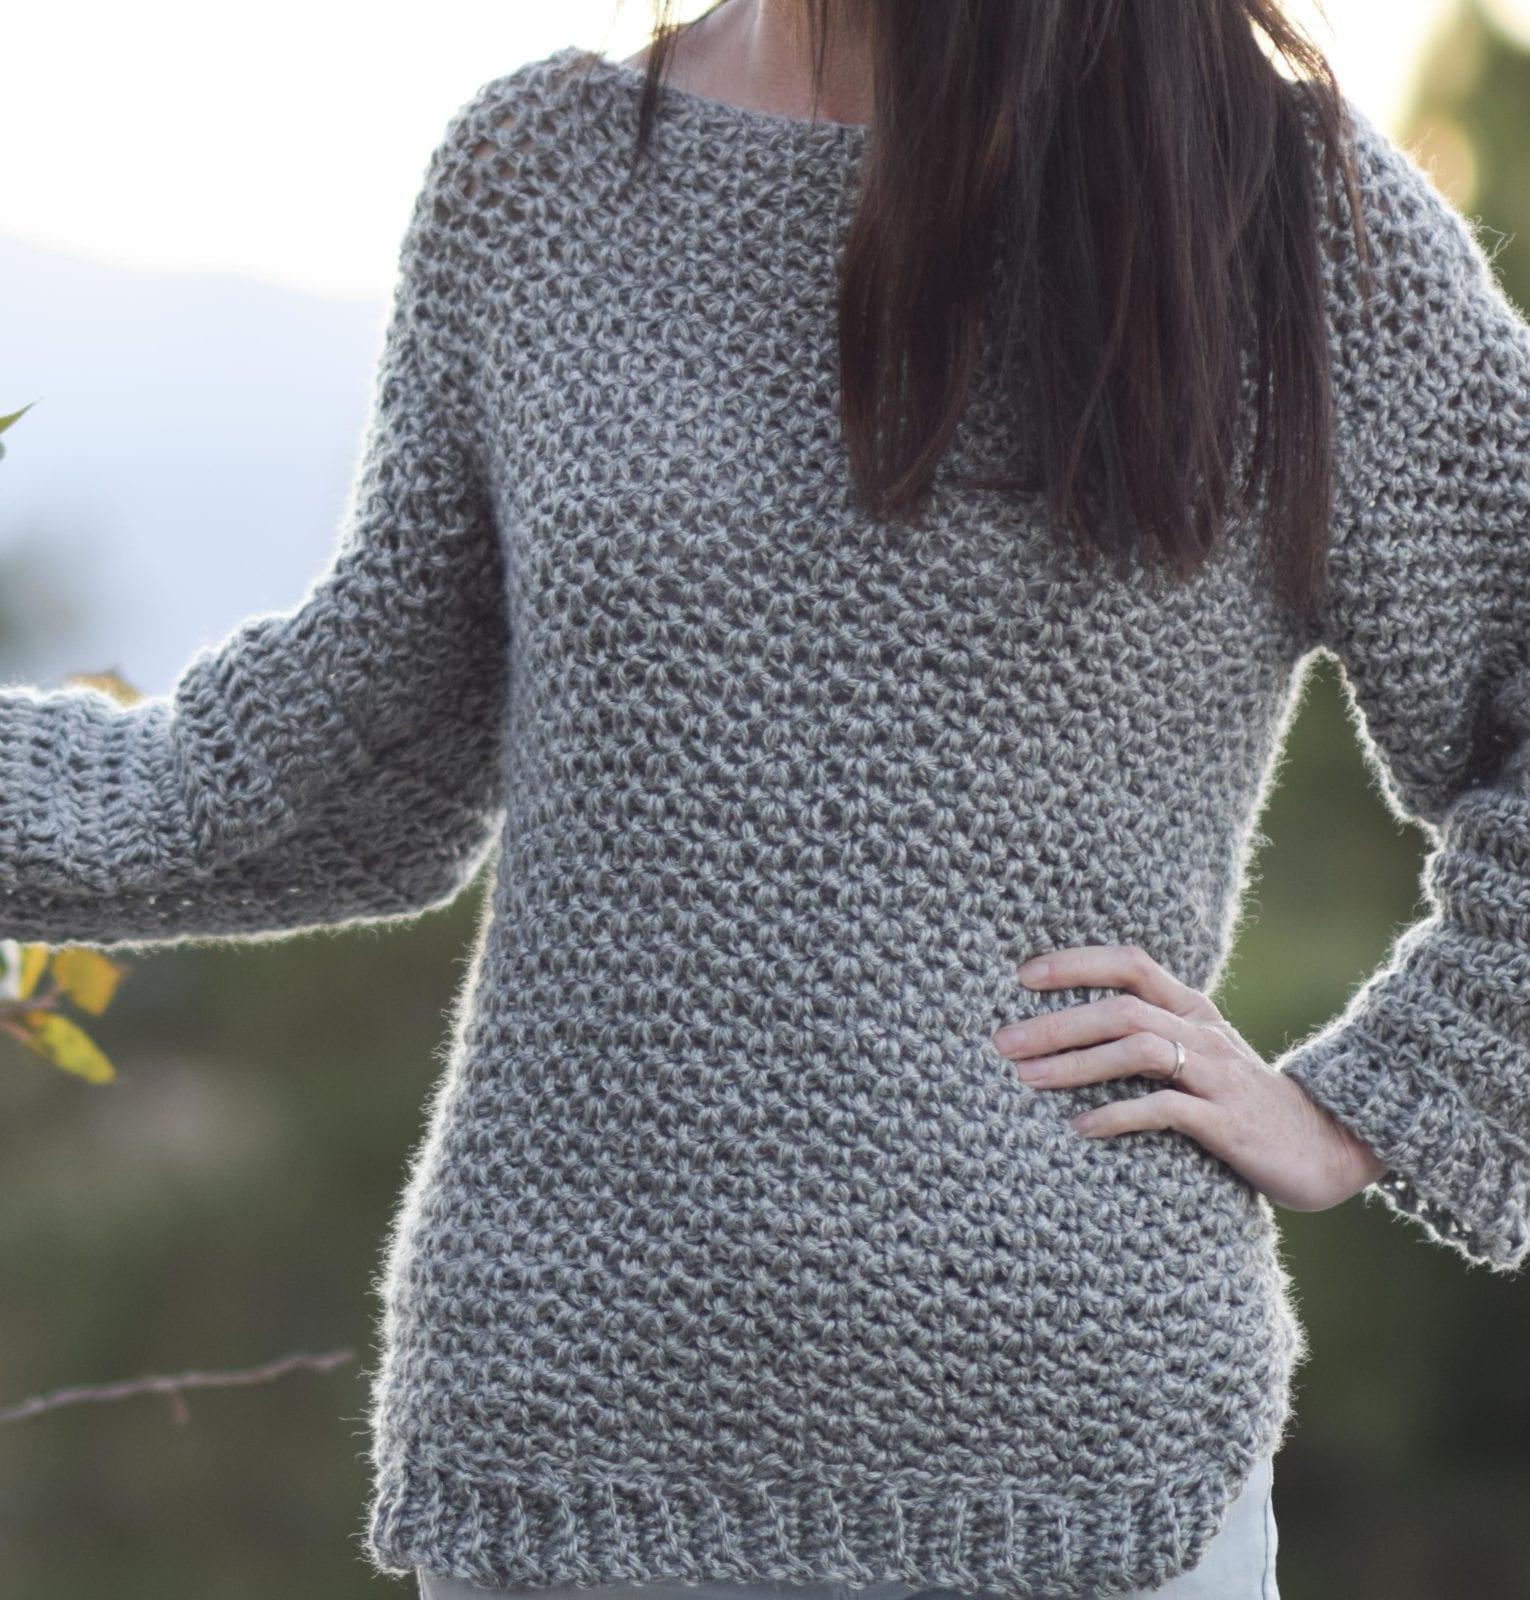 White ebay shipping crochet easy pattern free chunky cardigan fair mall